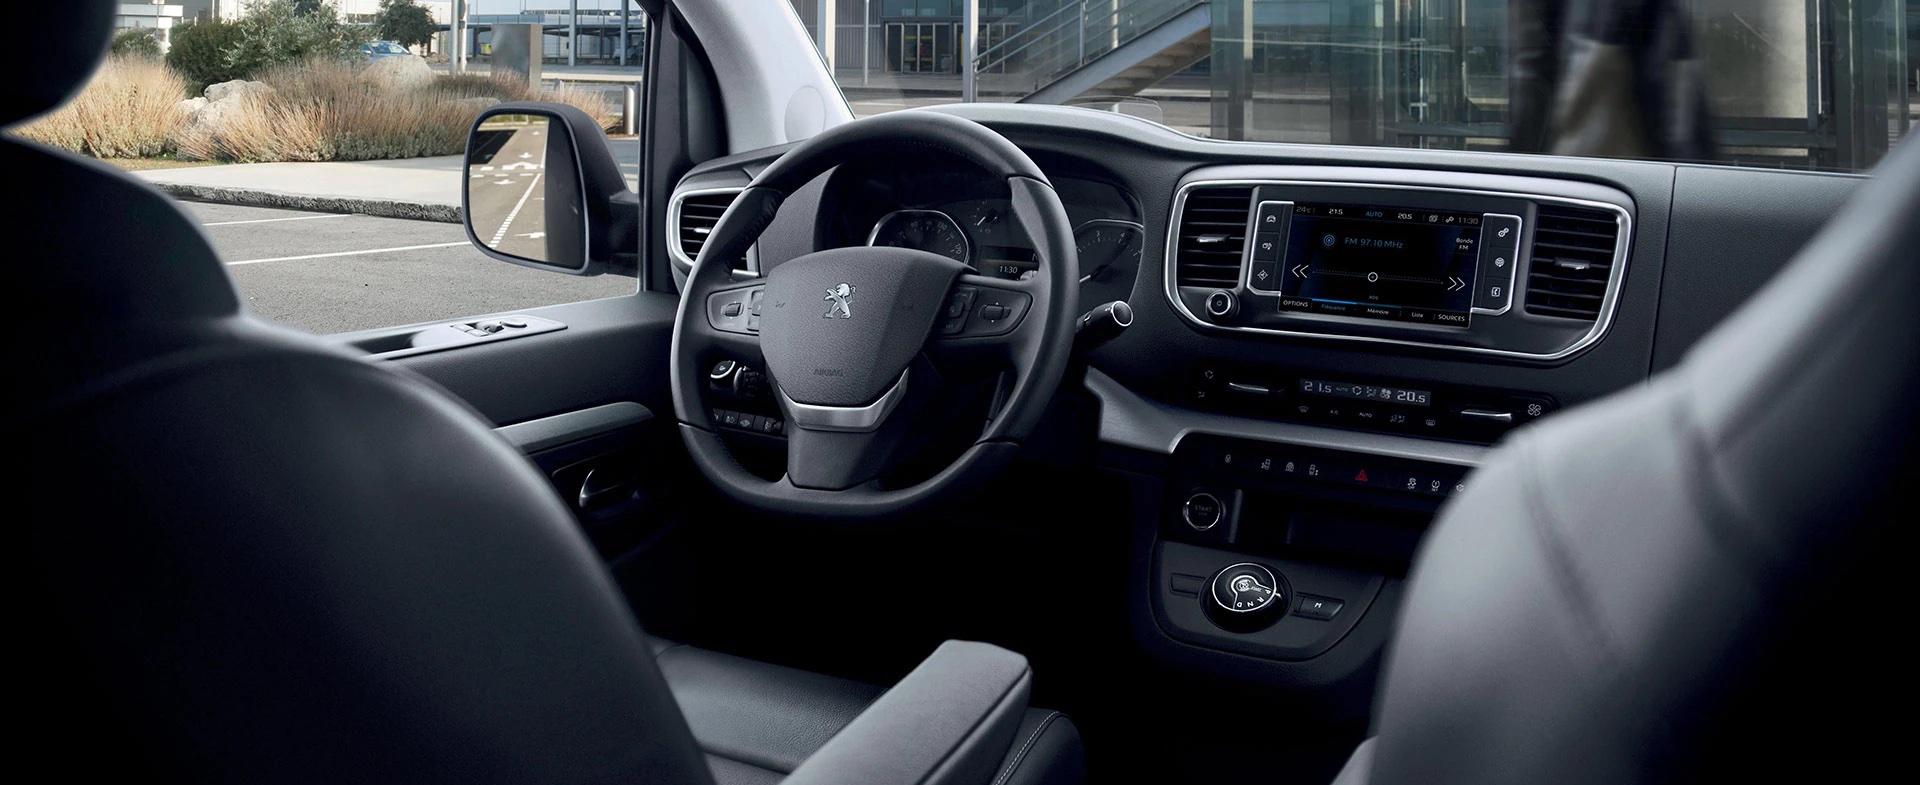 habitáculo do Peugeot Traveller